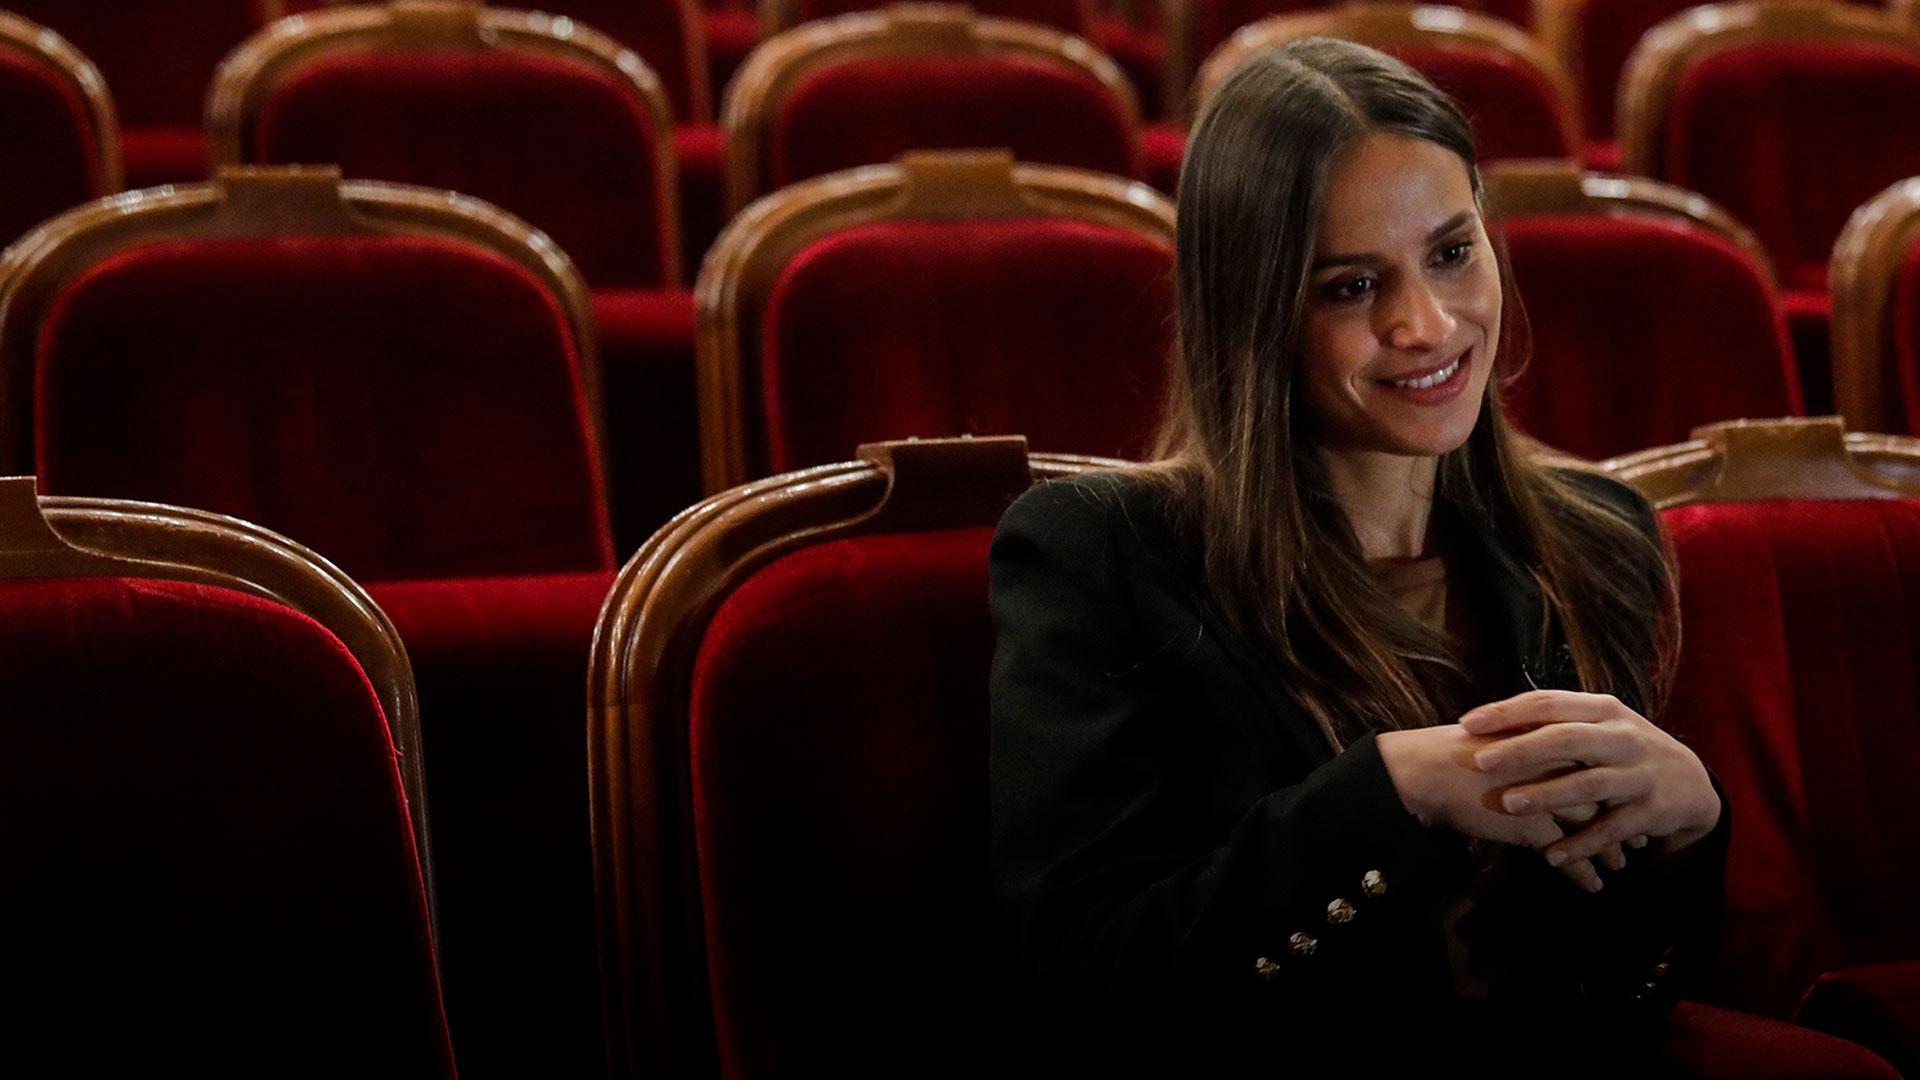 Mariana Monteiro, a Julieta contemporânea